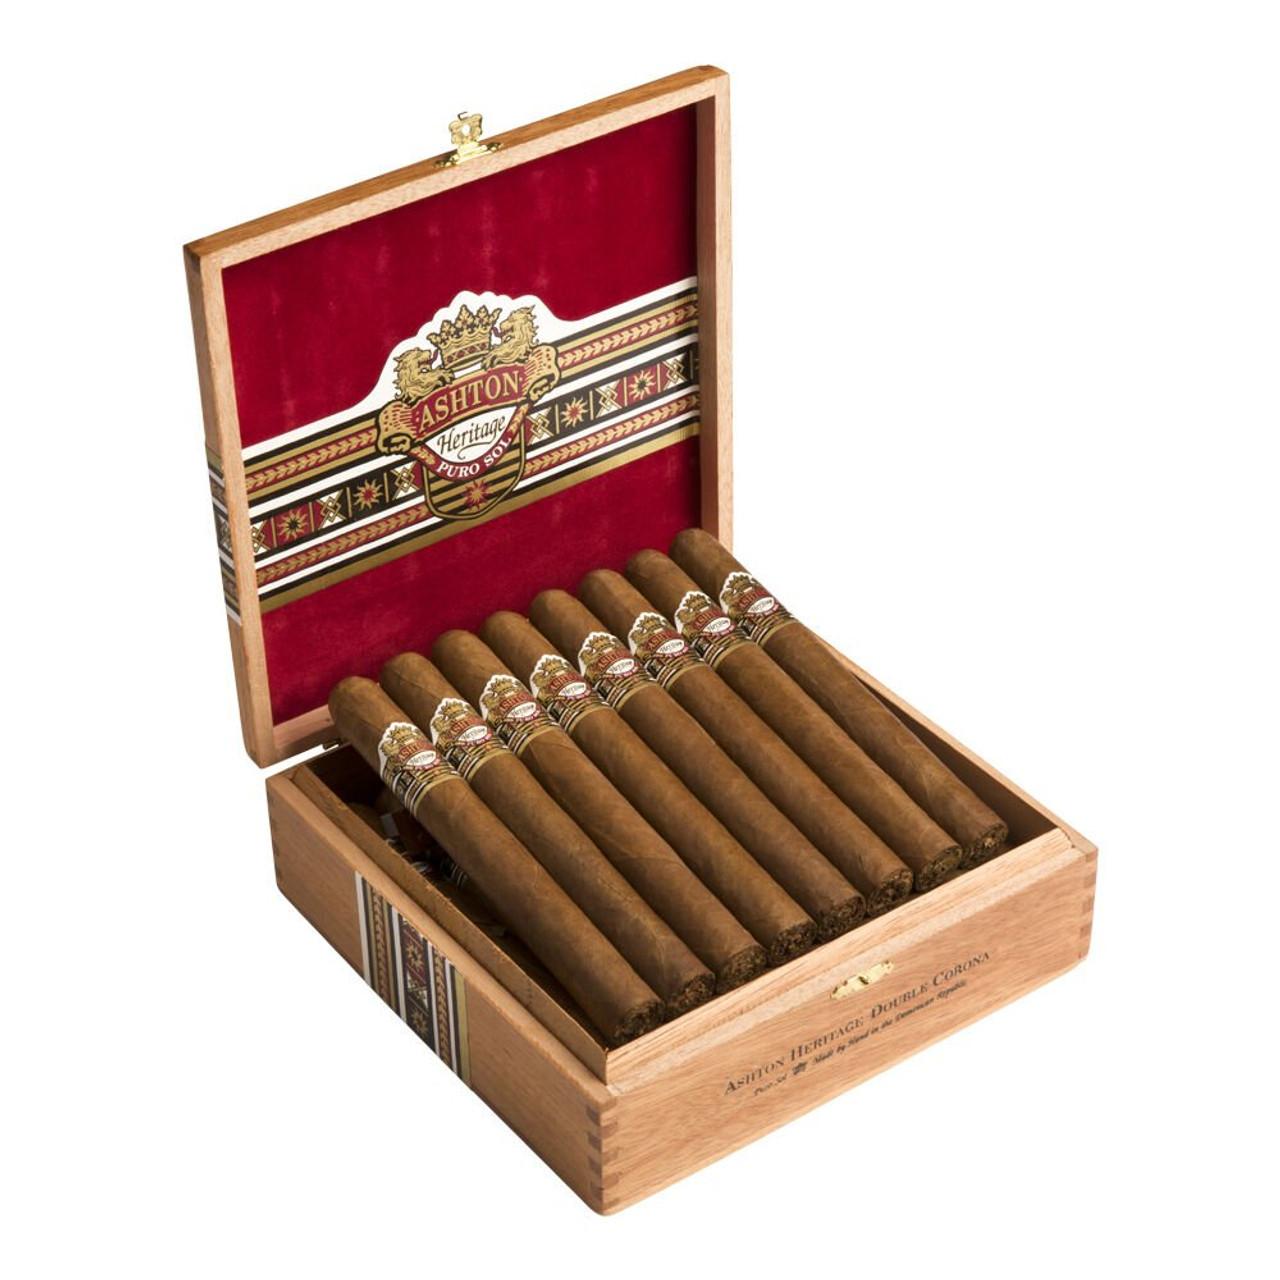 Ashton Heritage Puro Sol Double Corona Cigars - 7.0 x 52 (Box of 25)